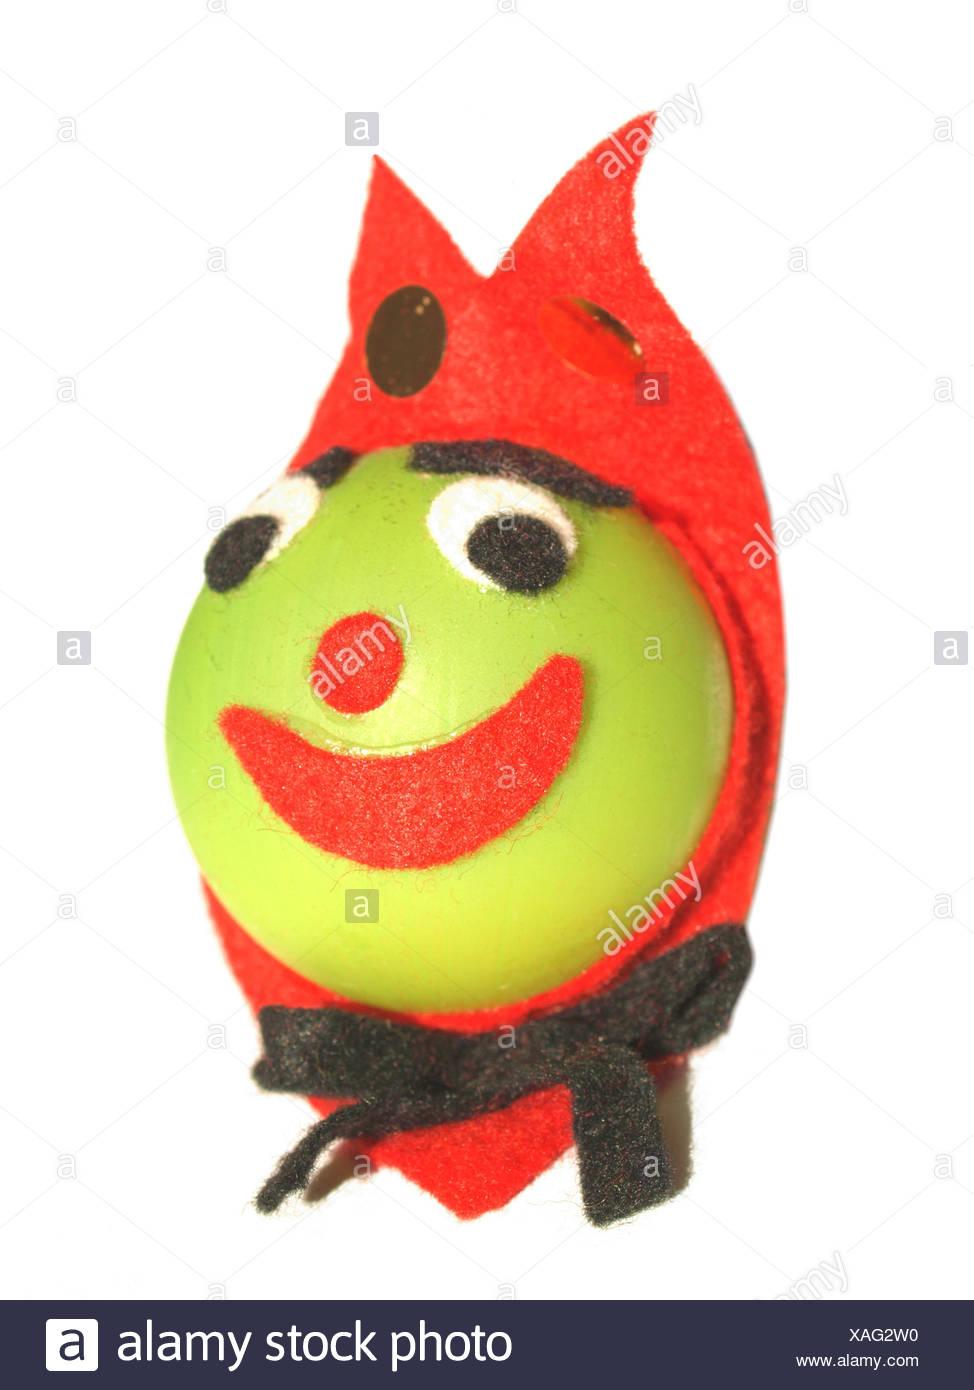 Joker Christmas Ornament.Ornament Party Celebration Decoration Christmas Bauble